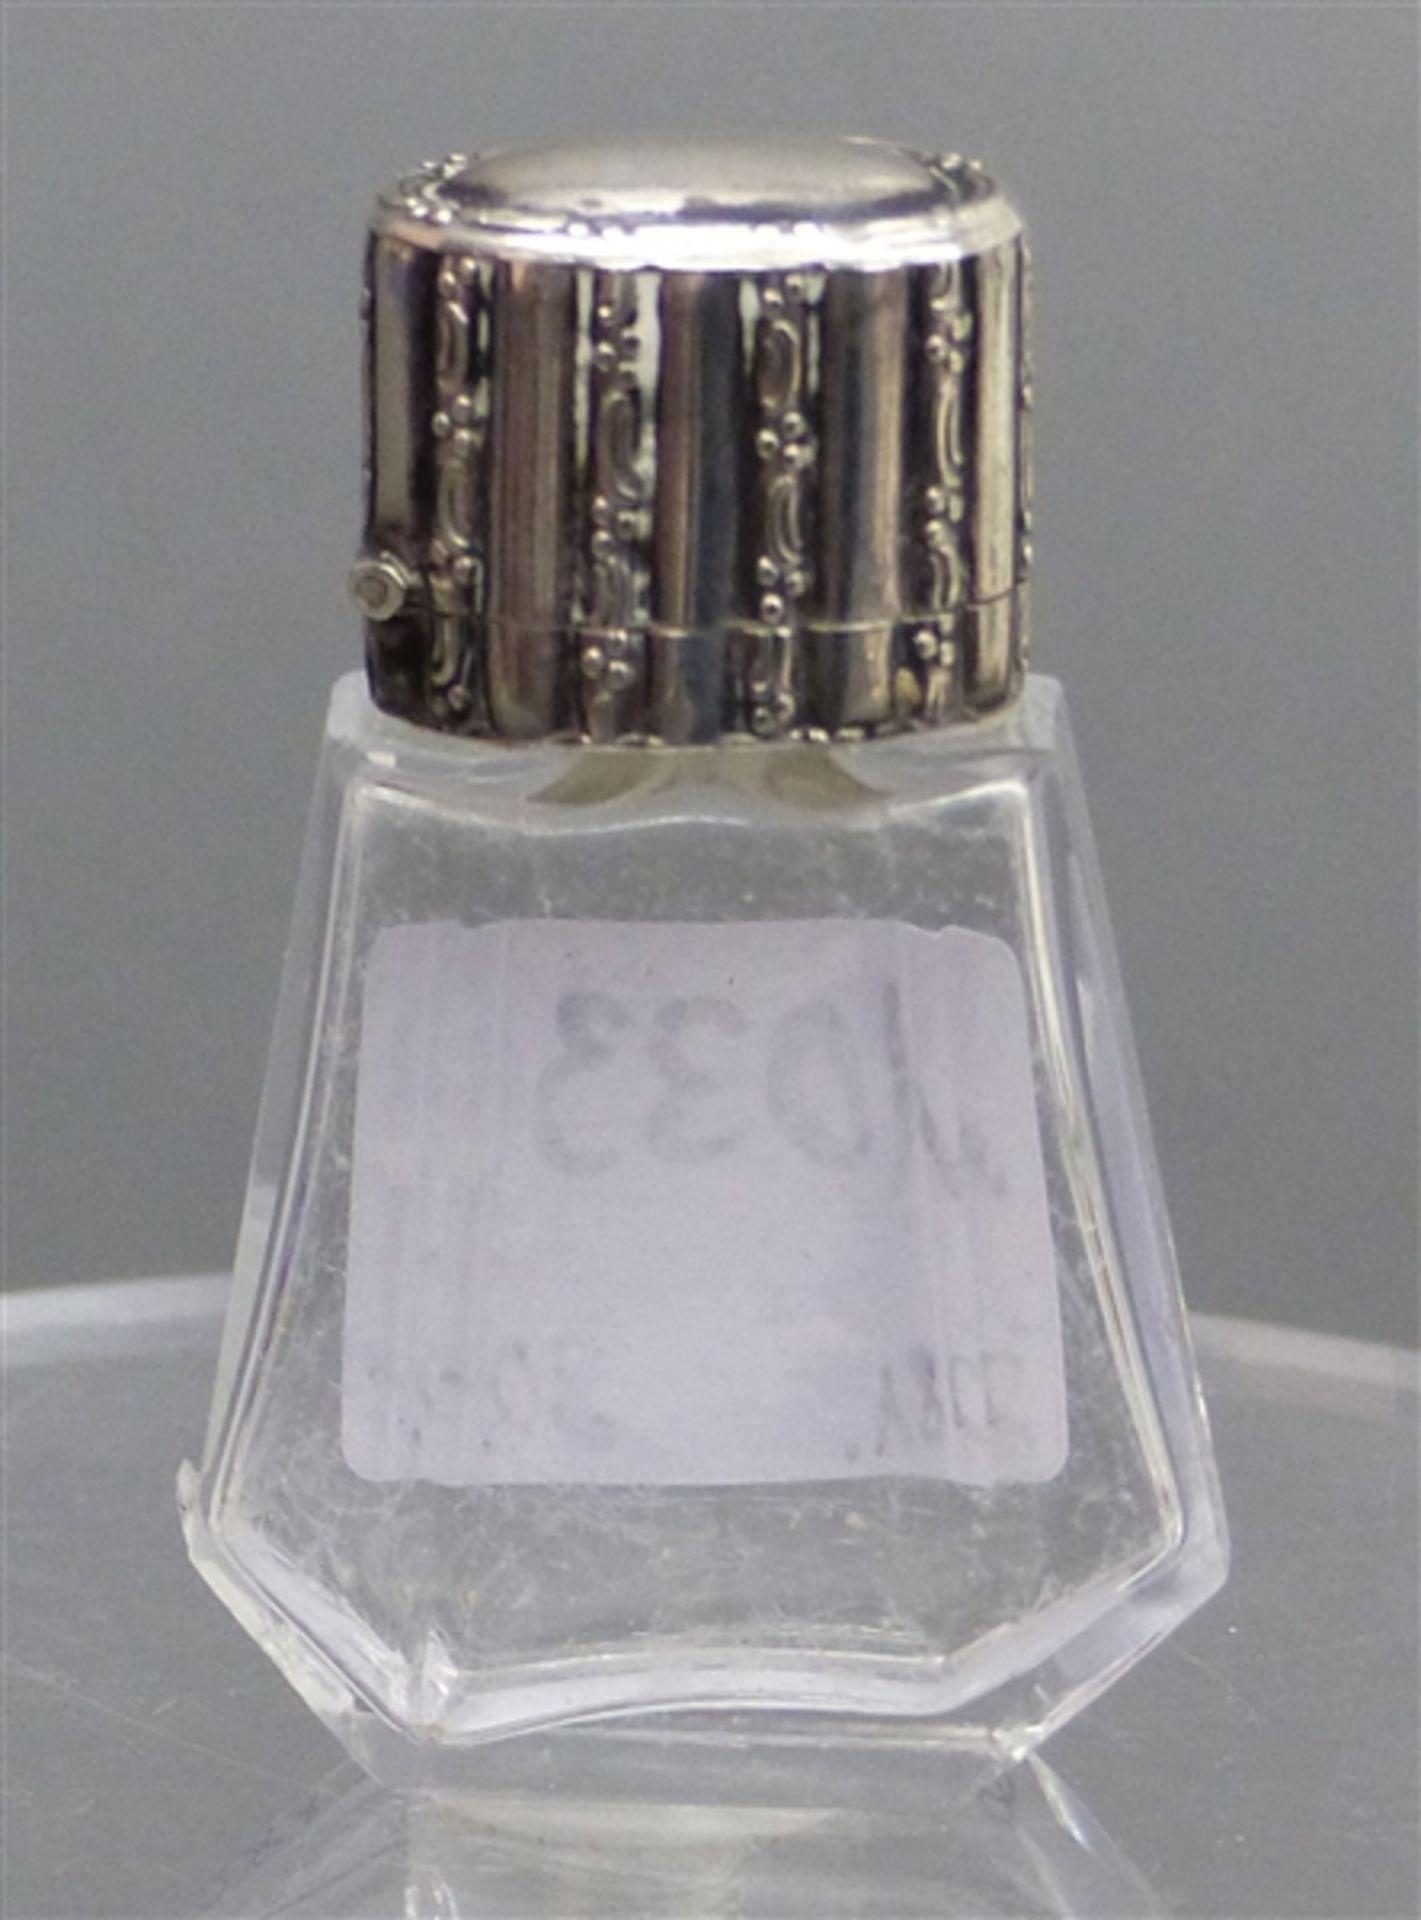 Parfümflacon farbloses Kristallglas, Silbermontur, um 1900, h 5,5 cm,